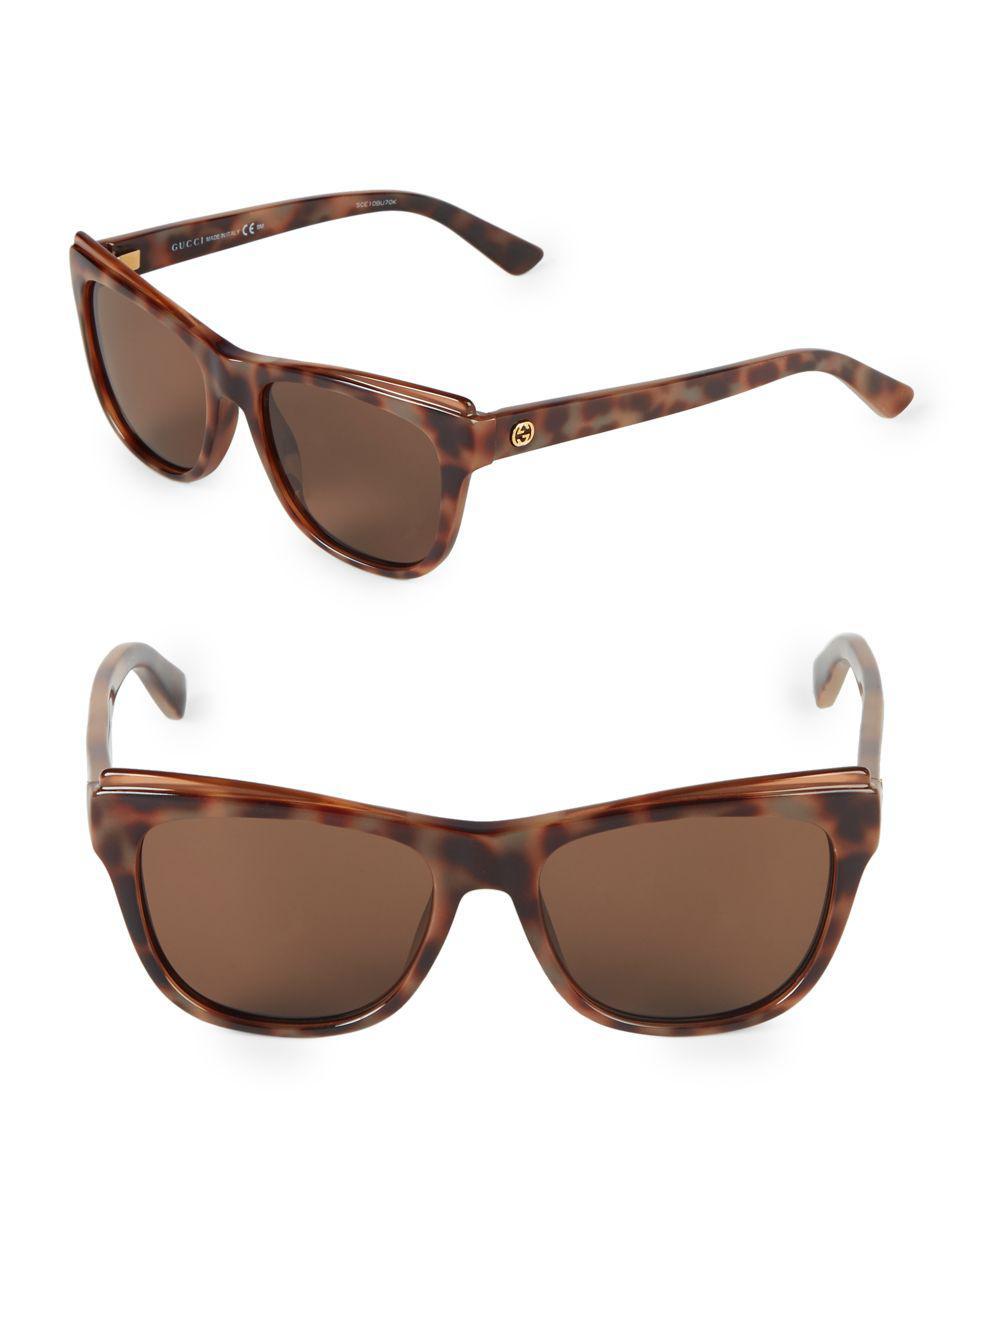 43f2b7312a7 Gucci 50mm Square Sunglasses in Brown - Lyst